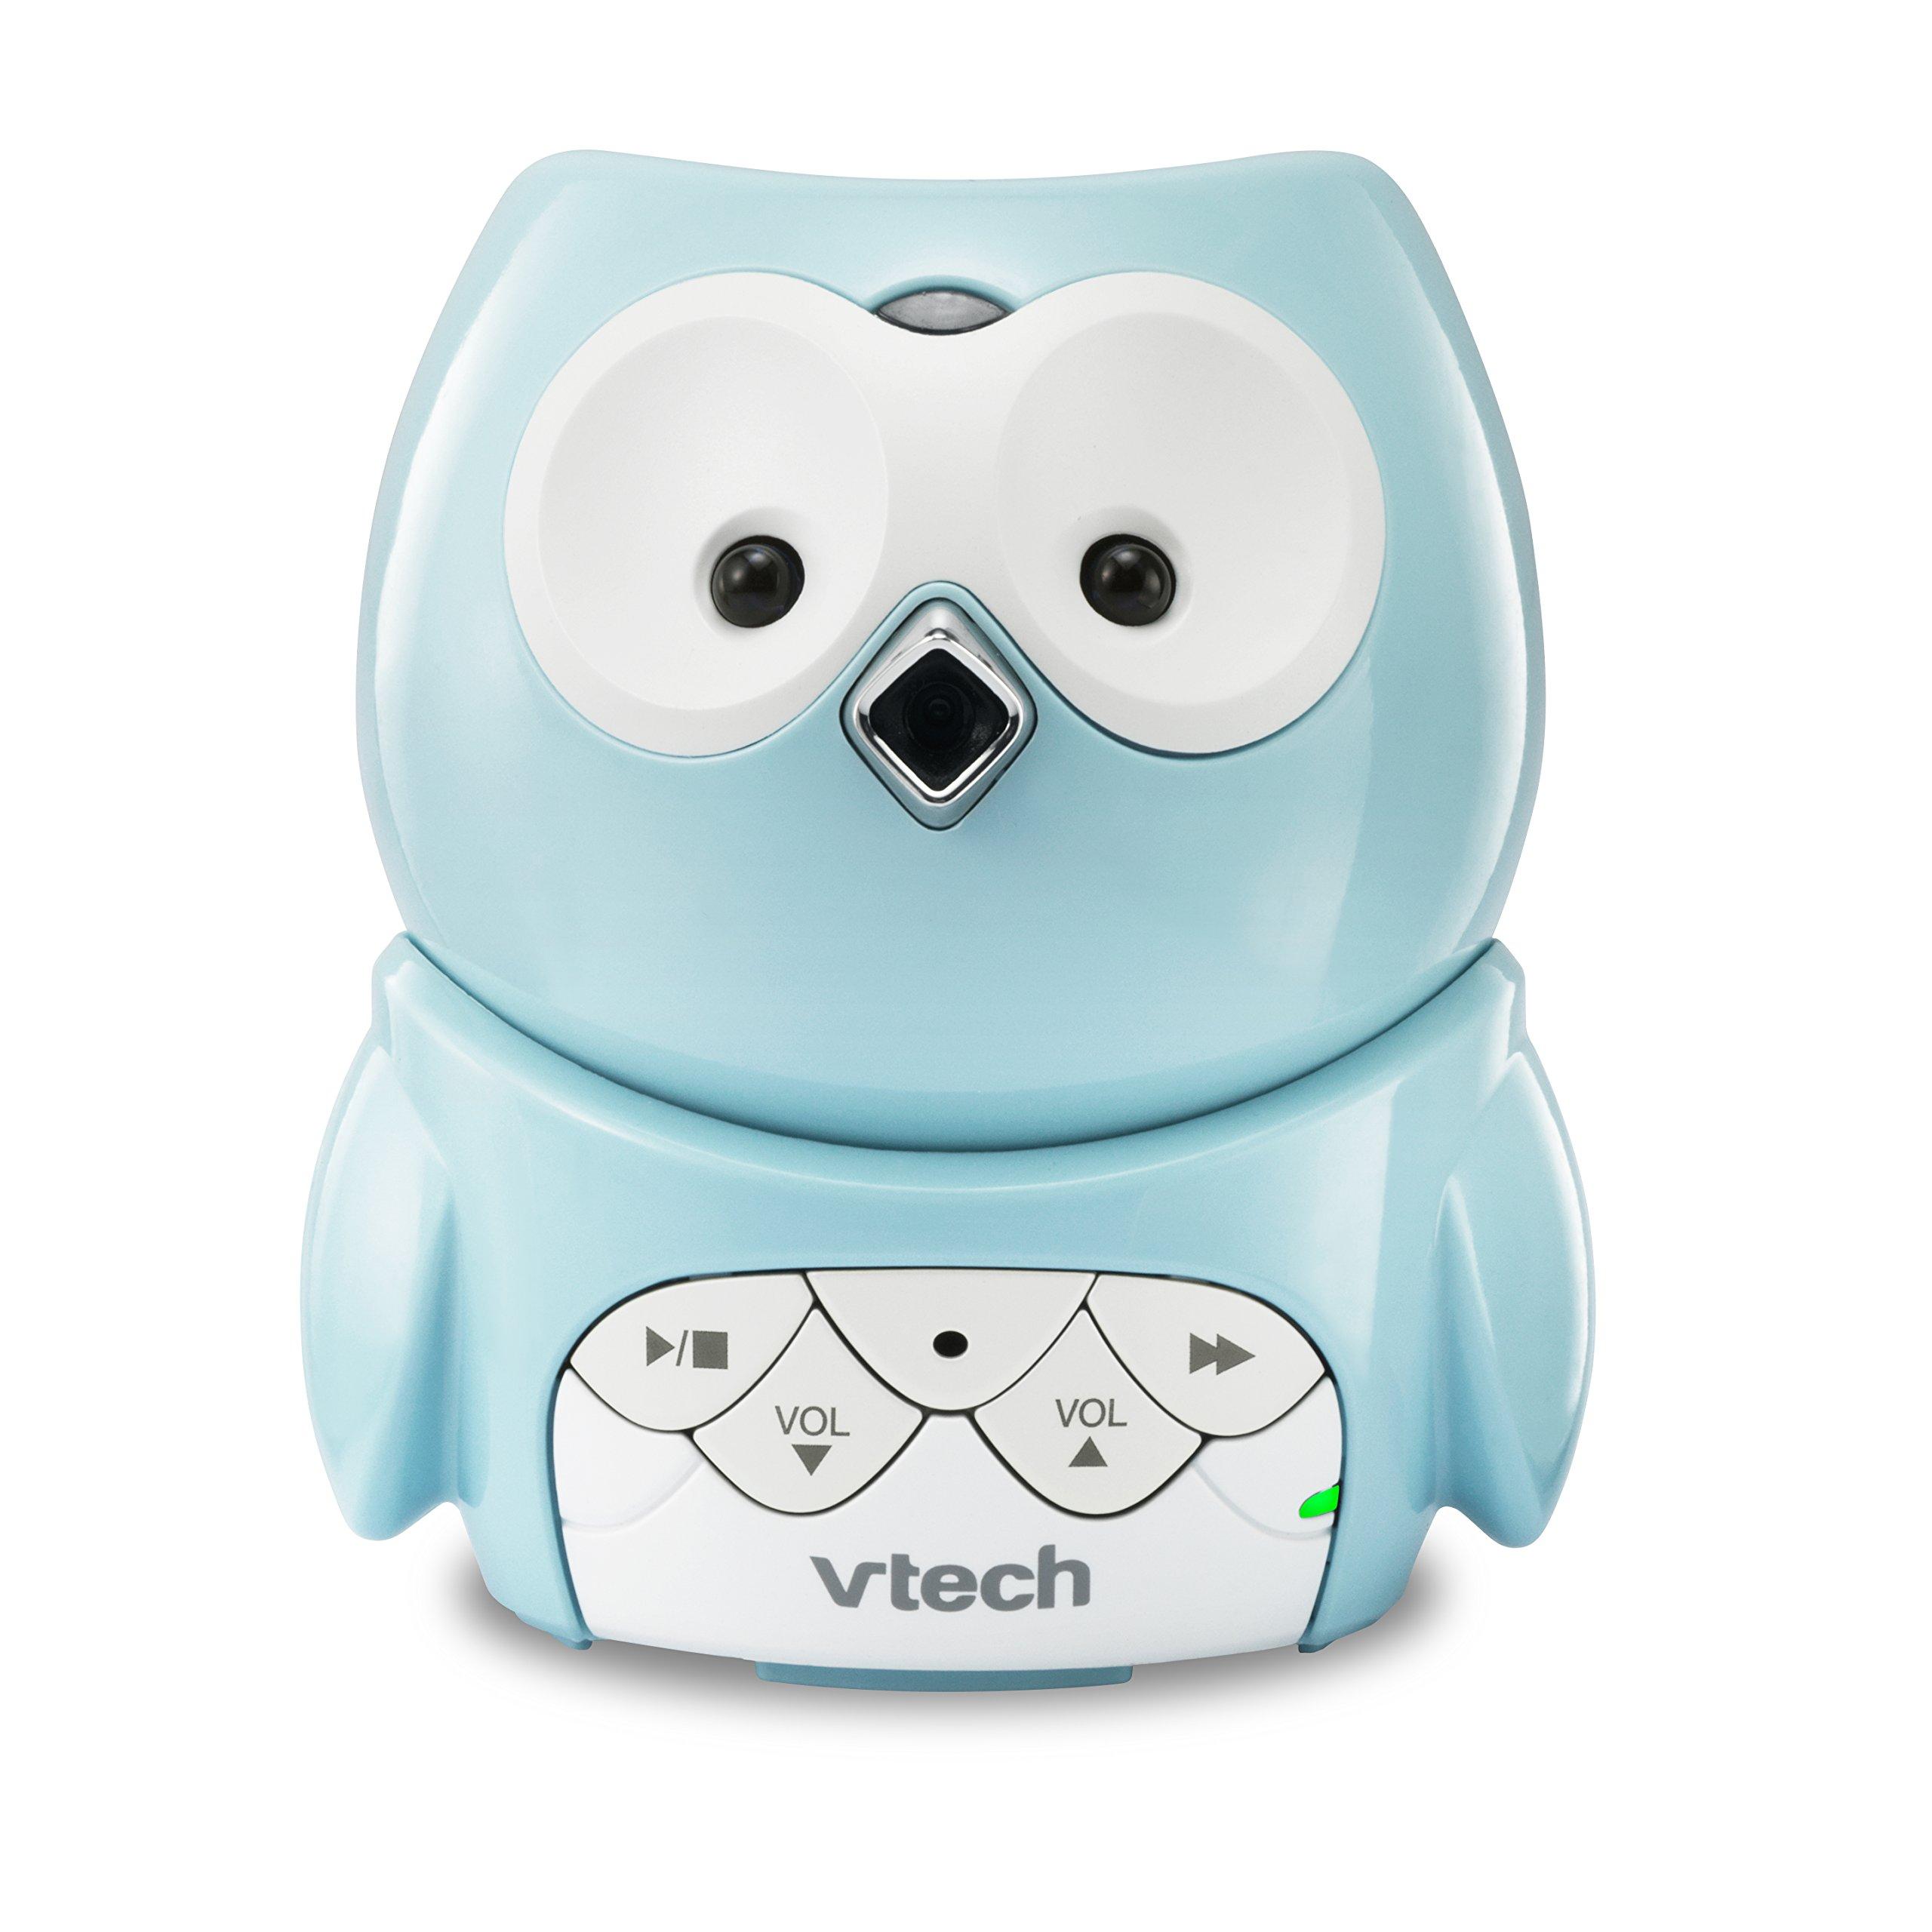 VTech VM315-15 Blue Owl Accessory Video Camera Only for VTech VM345 Series Baby Monitors